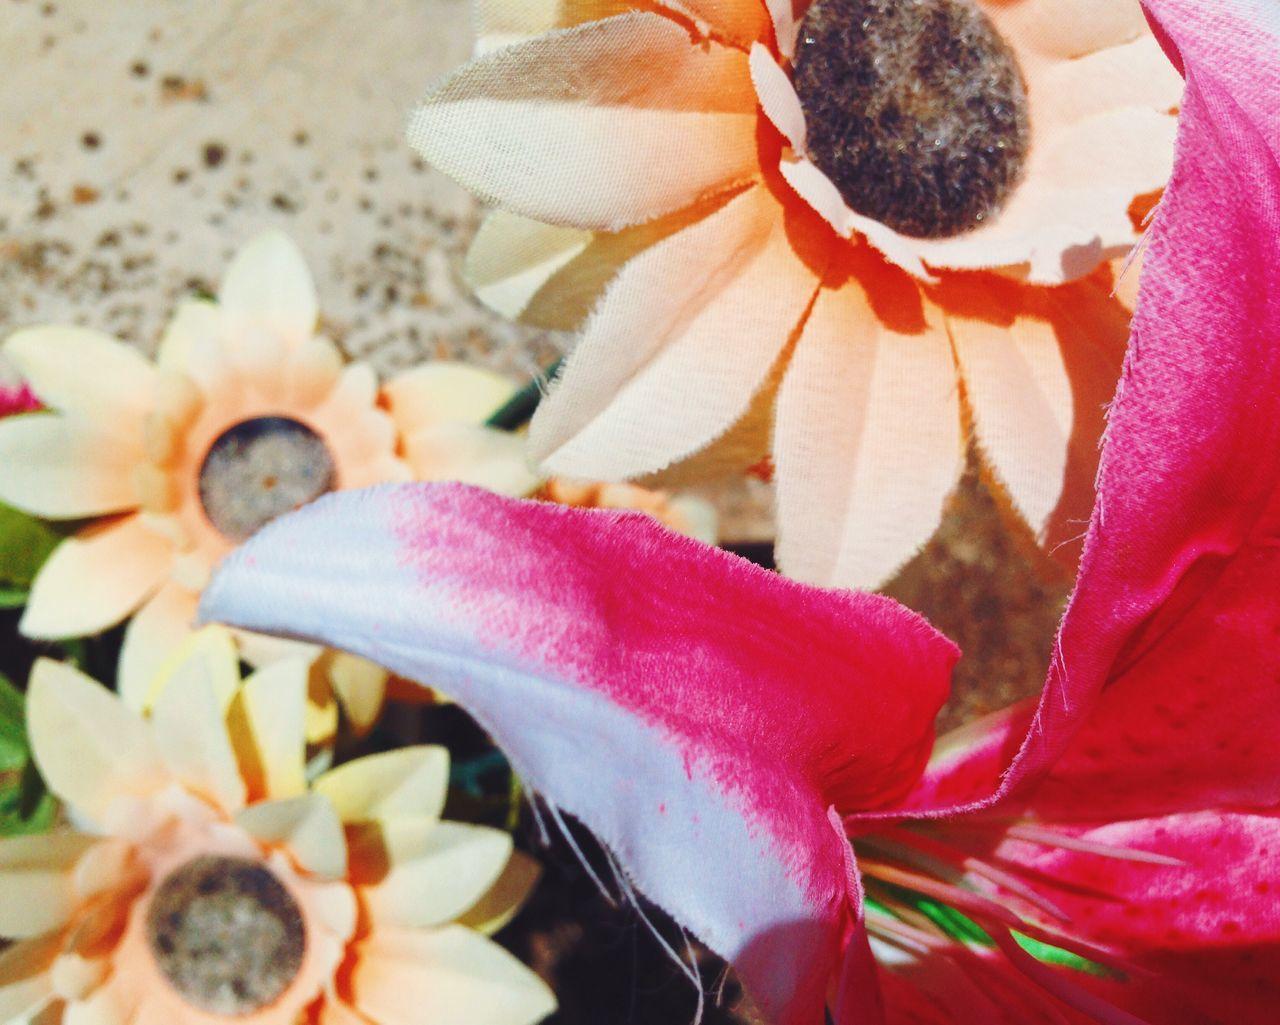 Botany Close-up Detail Fake Fake Flowers Flower Flower Head Focus On Foreground In Bloom Orange Petal Pink Color Red Selective Focus Sunflower